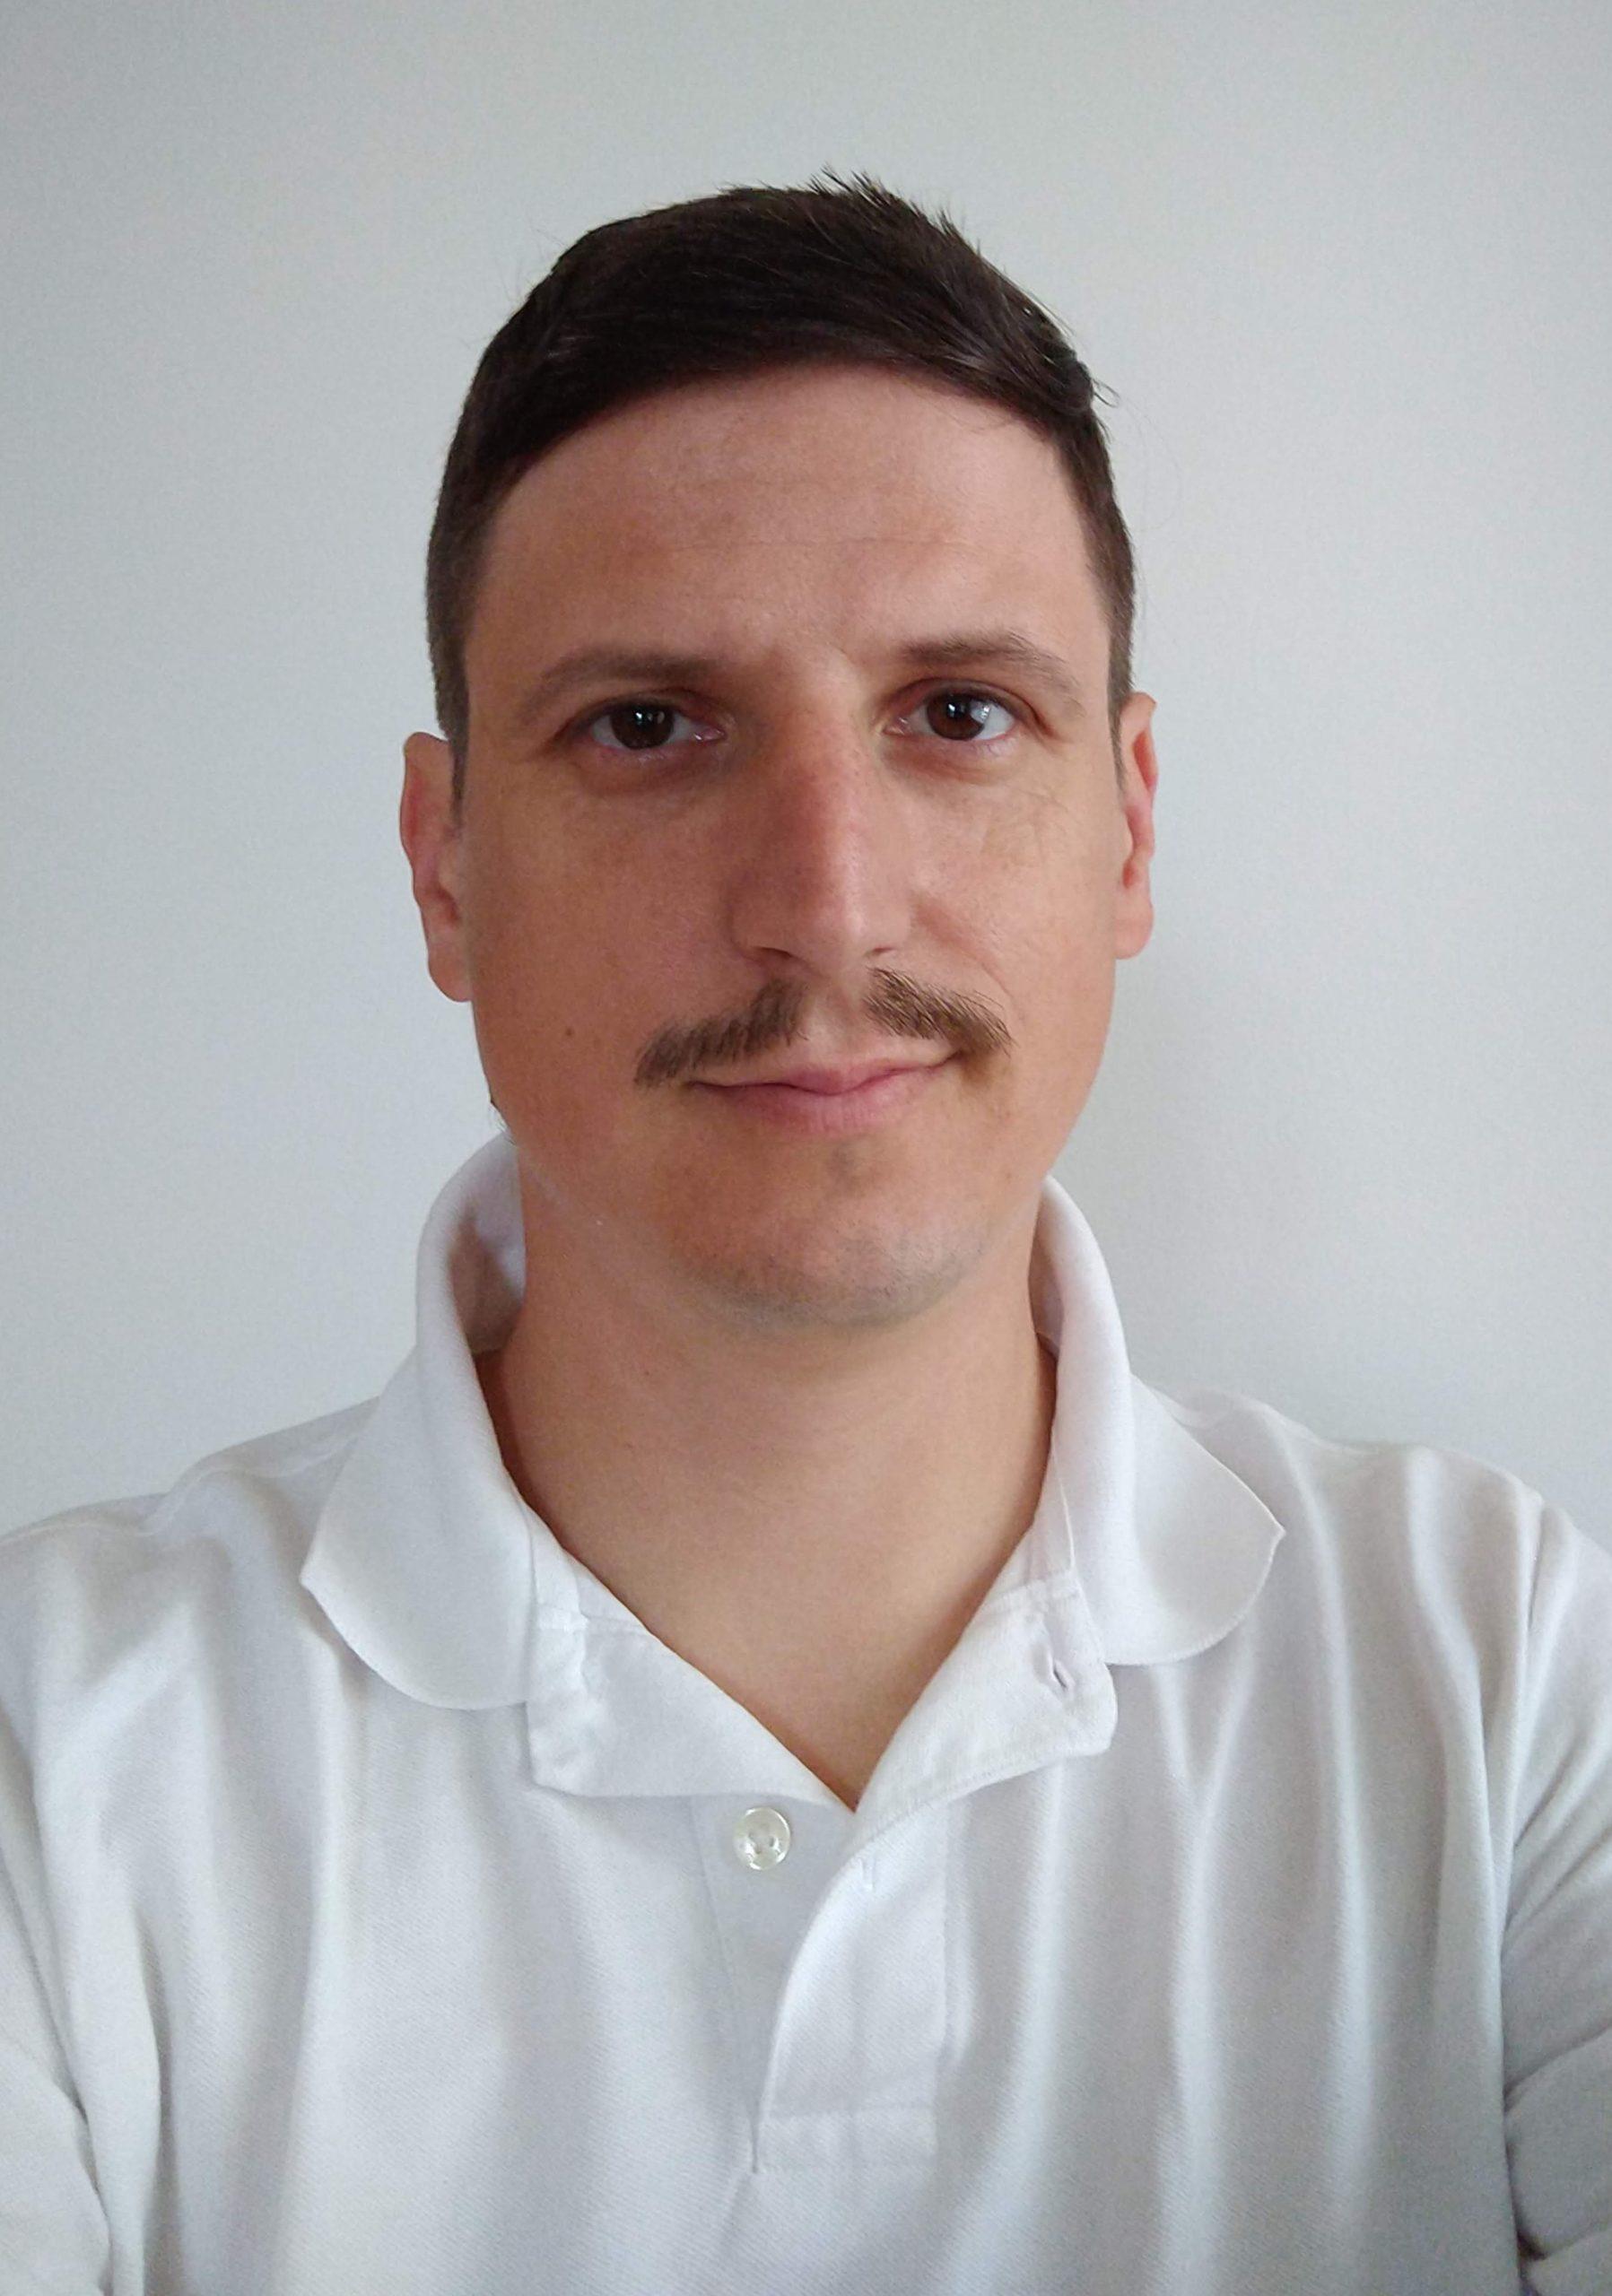 Michal Jurecký